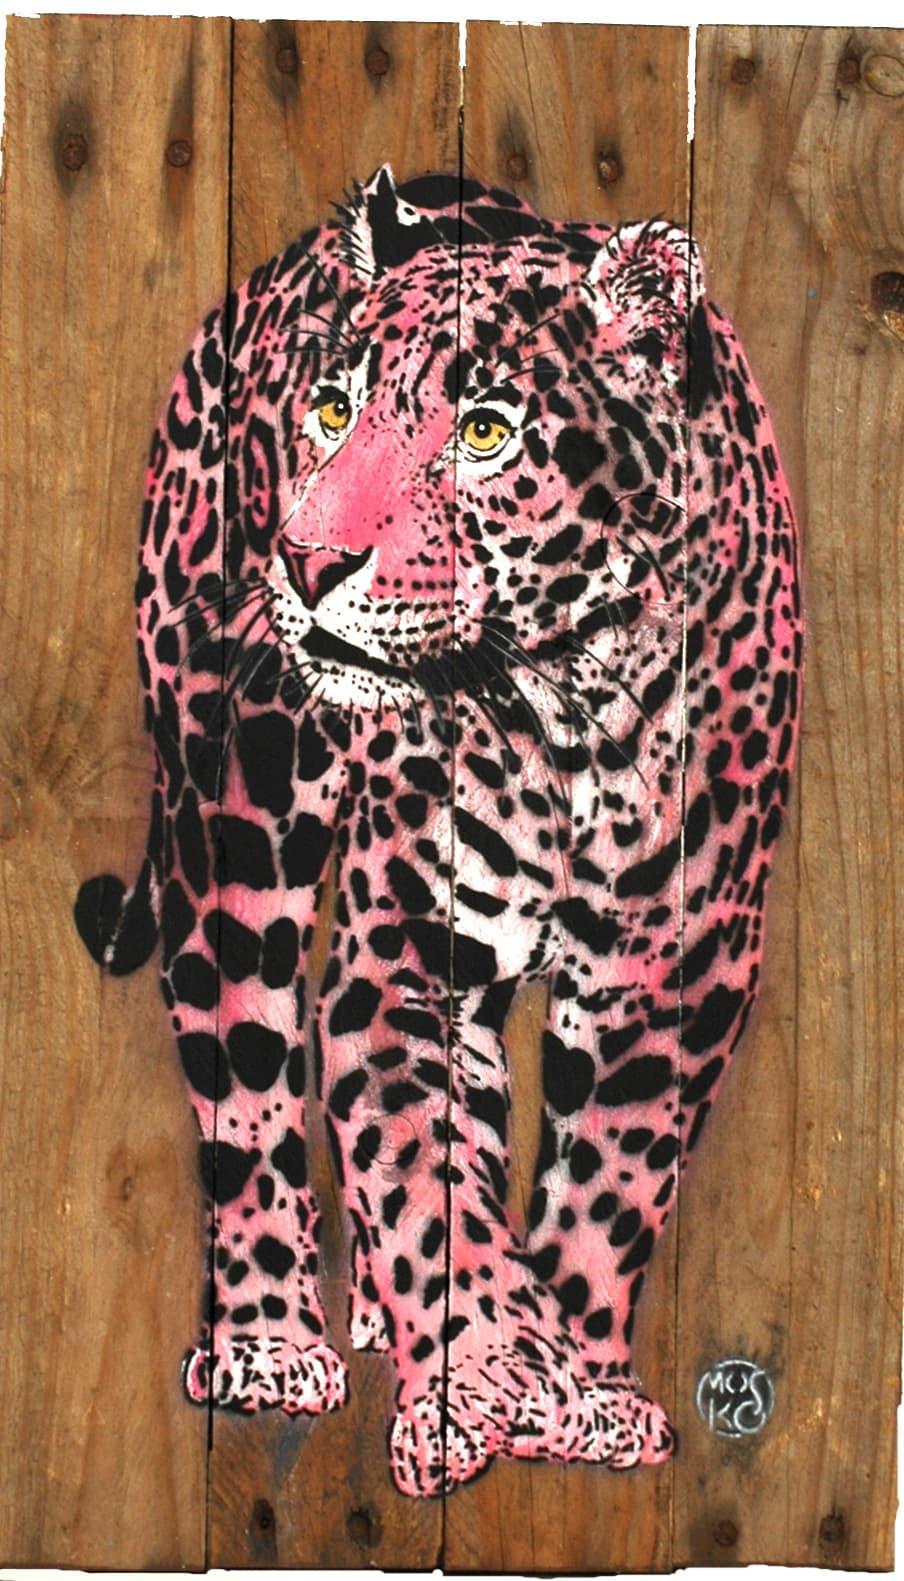 Galerie Art Jingle MOSKO Petit Bébé Jaguar Rose 50 x 30 cm 2021